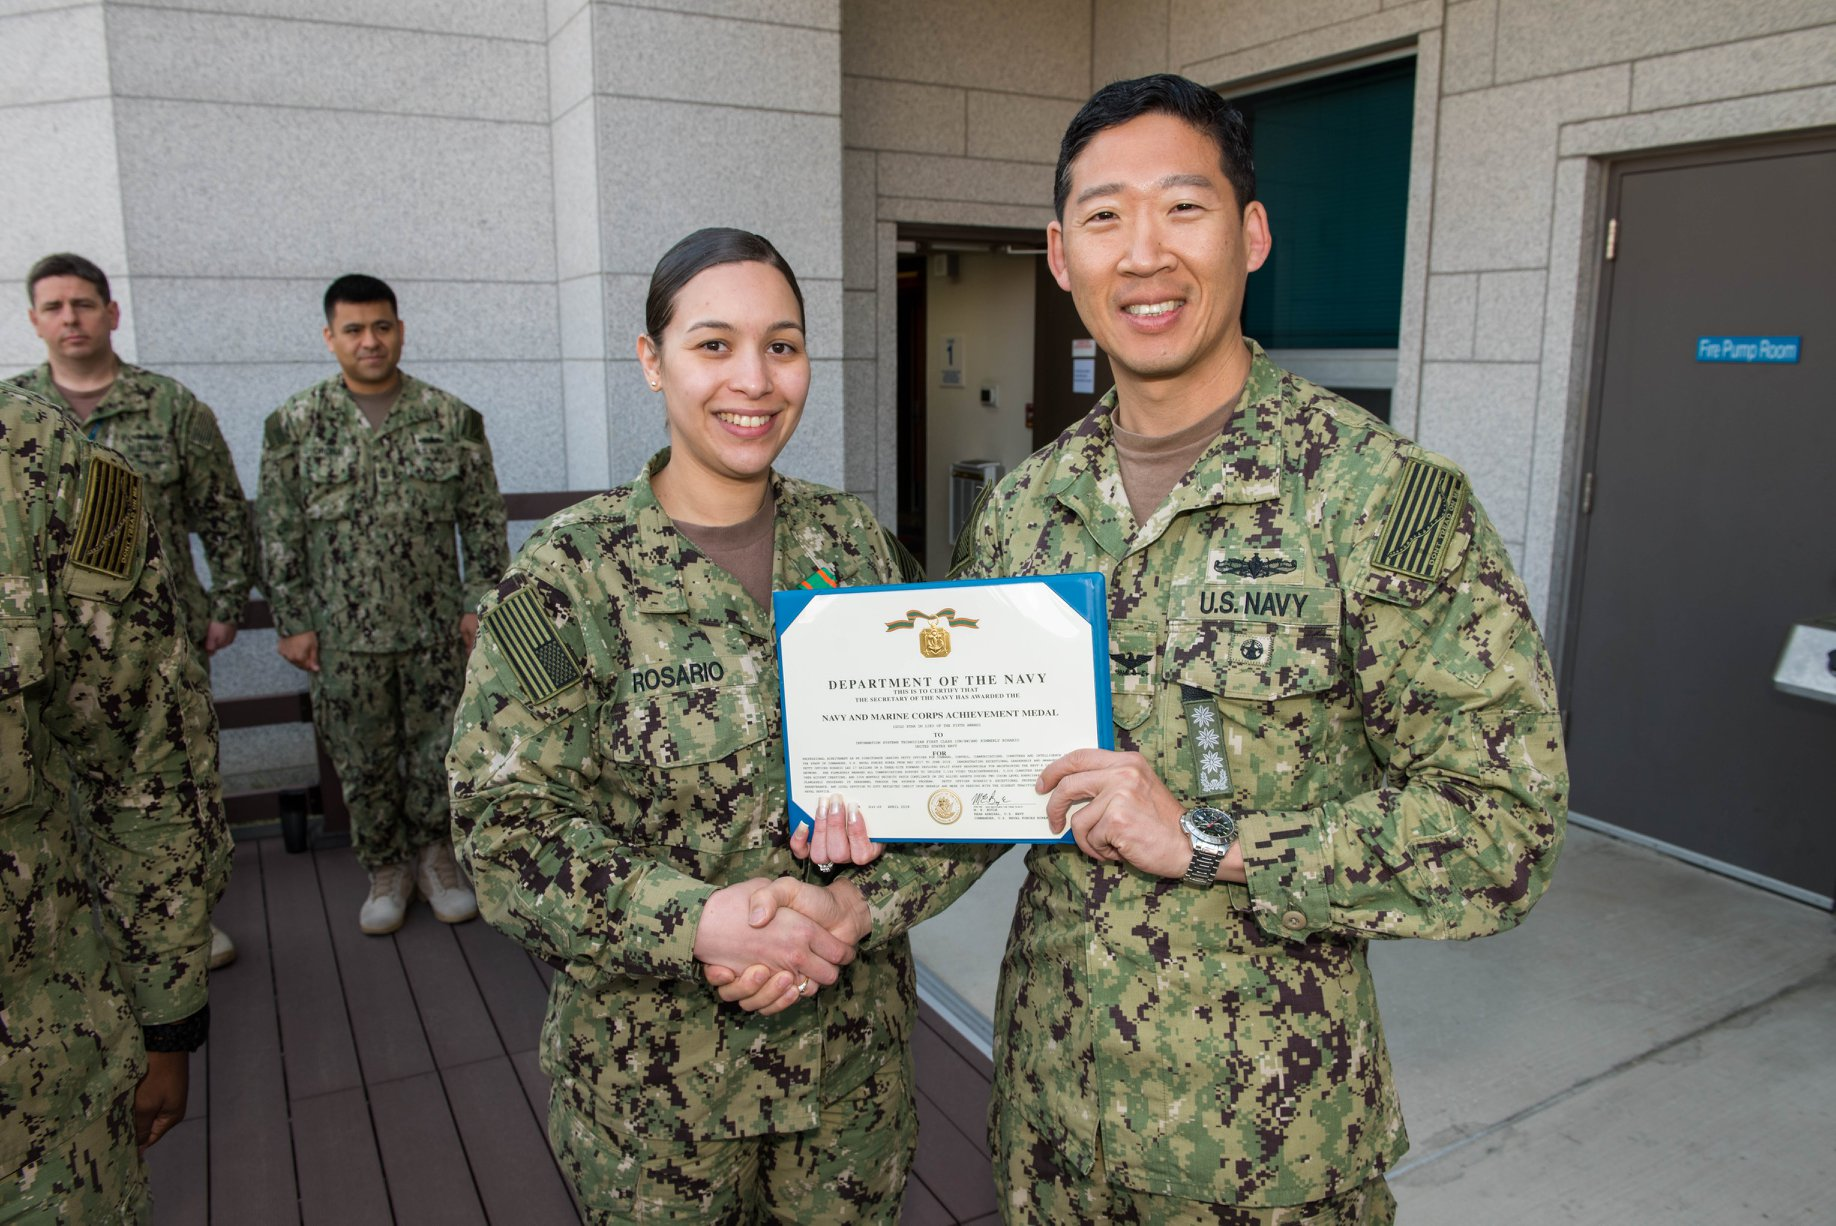 File:IT1 Kimberly Rosario awarded Navy and Marine Corps